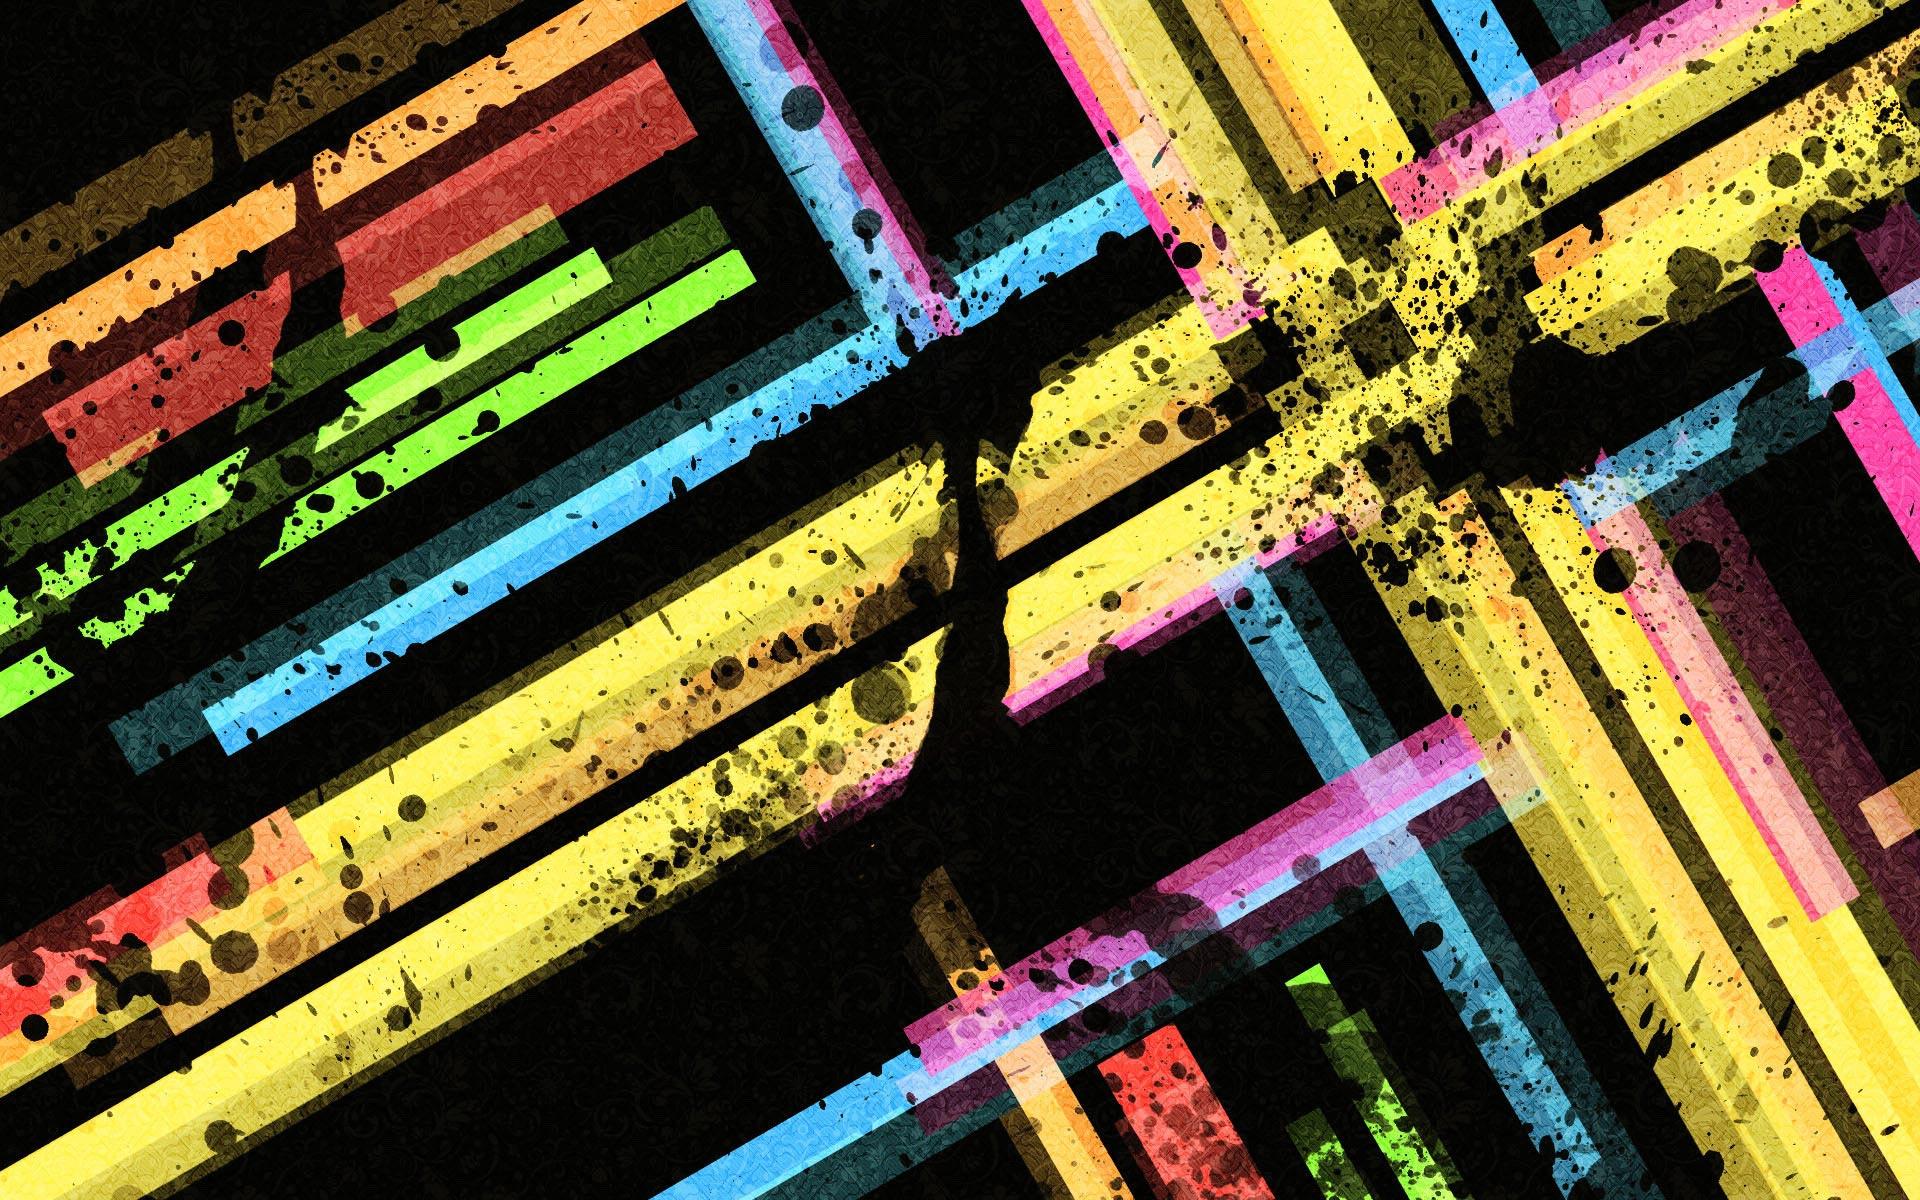 HD Wallpaper Themes Futuristic graphic arts hd wallpaper 1920x1200